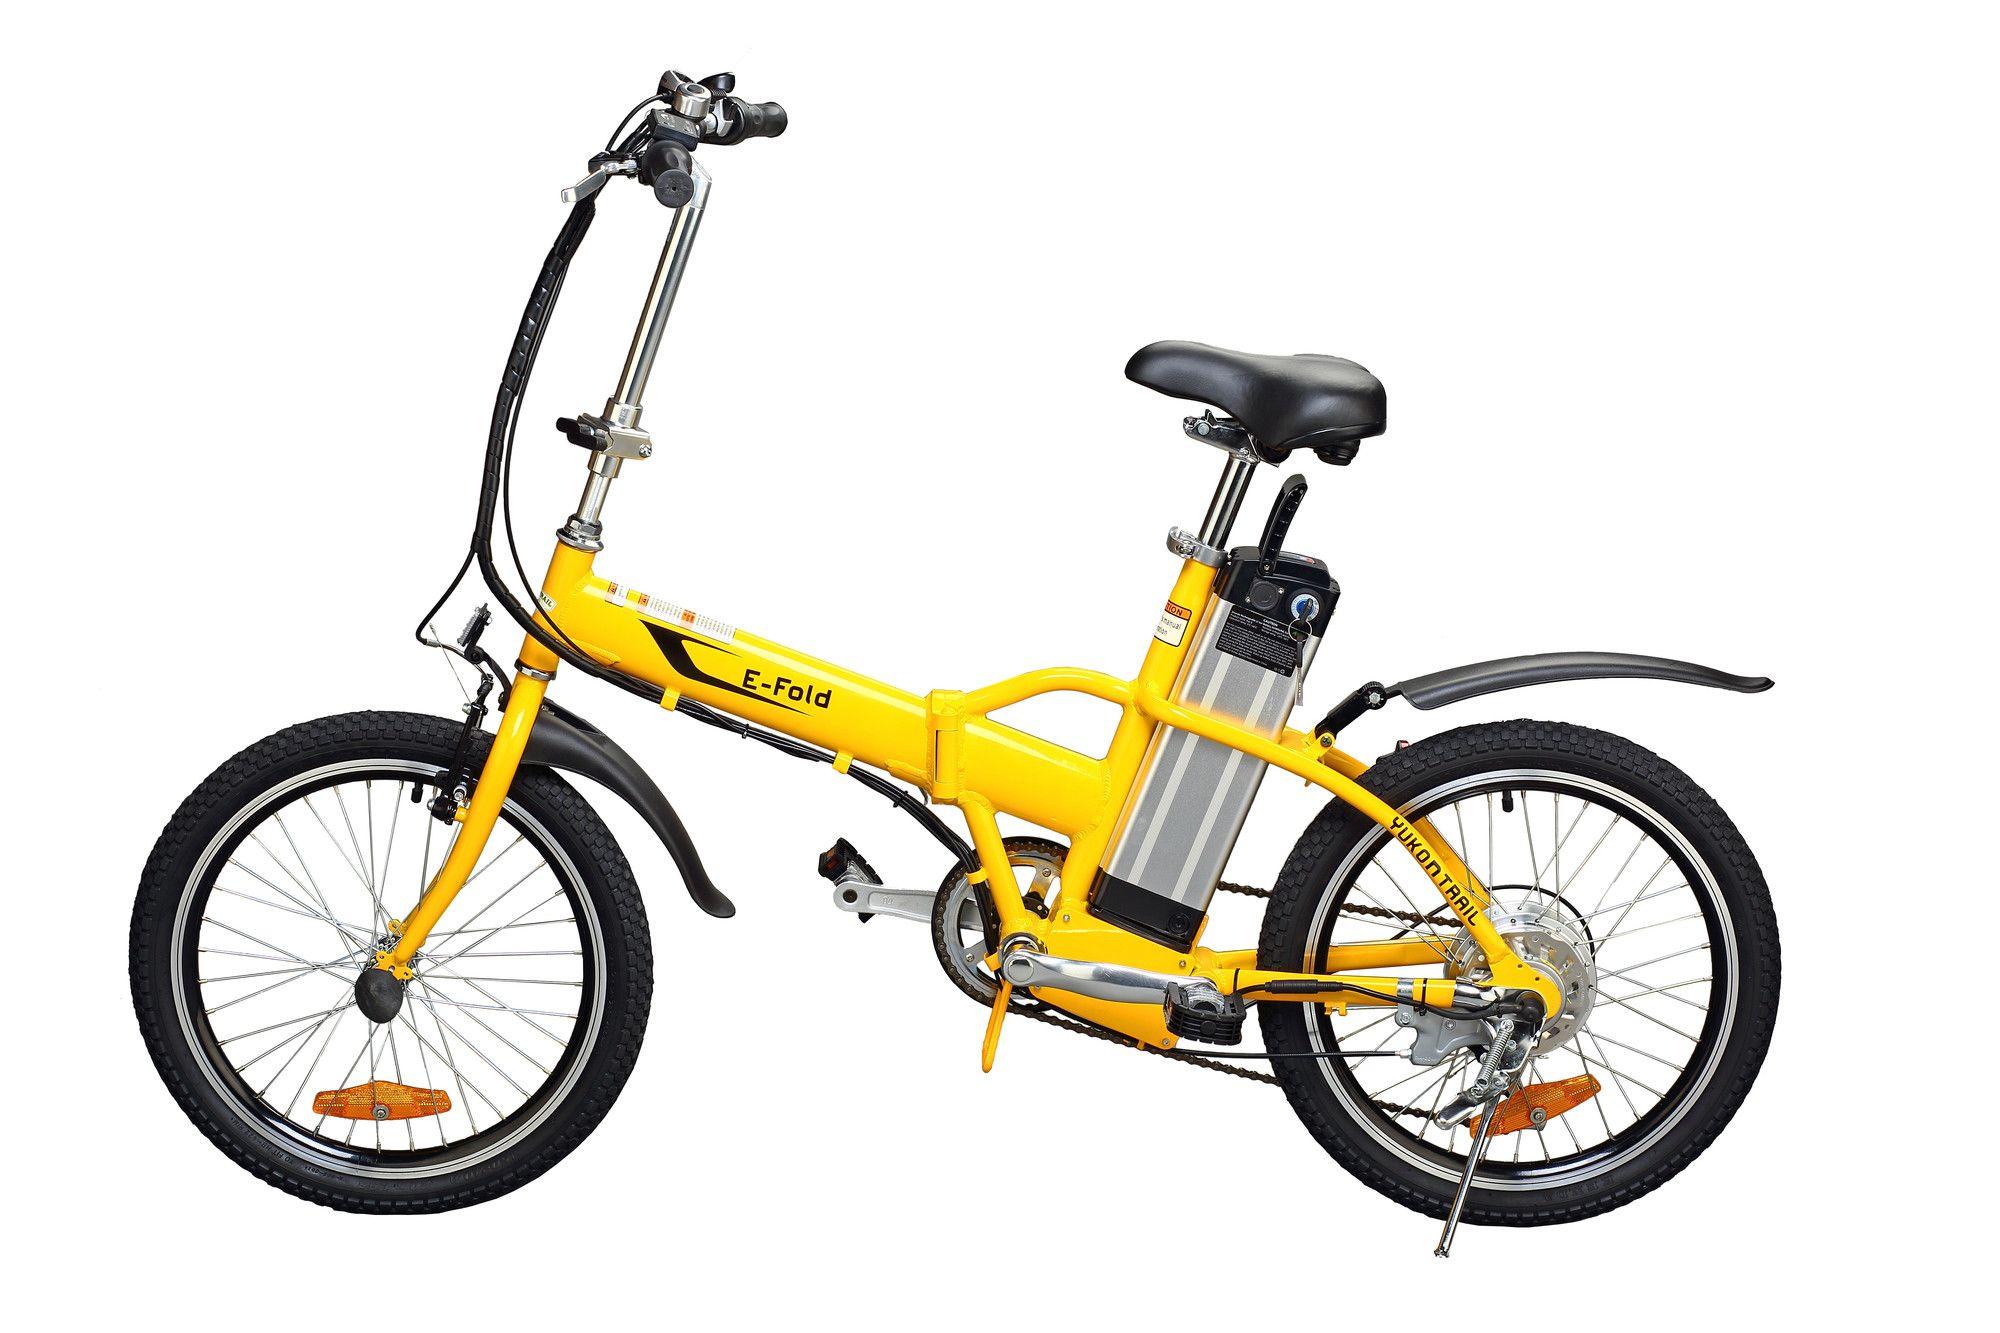 Yukon Trail E Fold Folding Electric Bike Electric Bike Folding Electric Bike Electric Bicycle